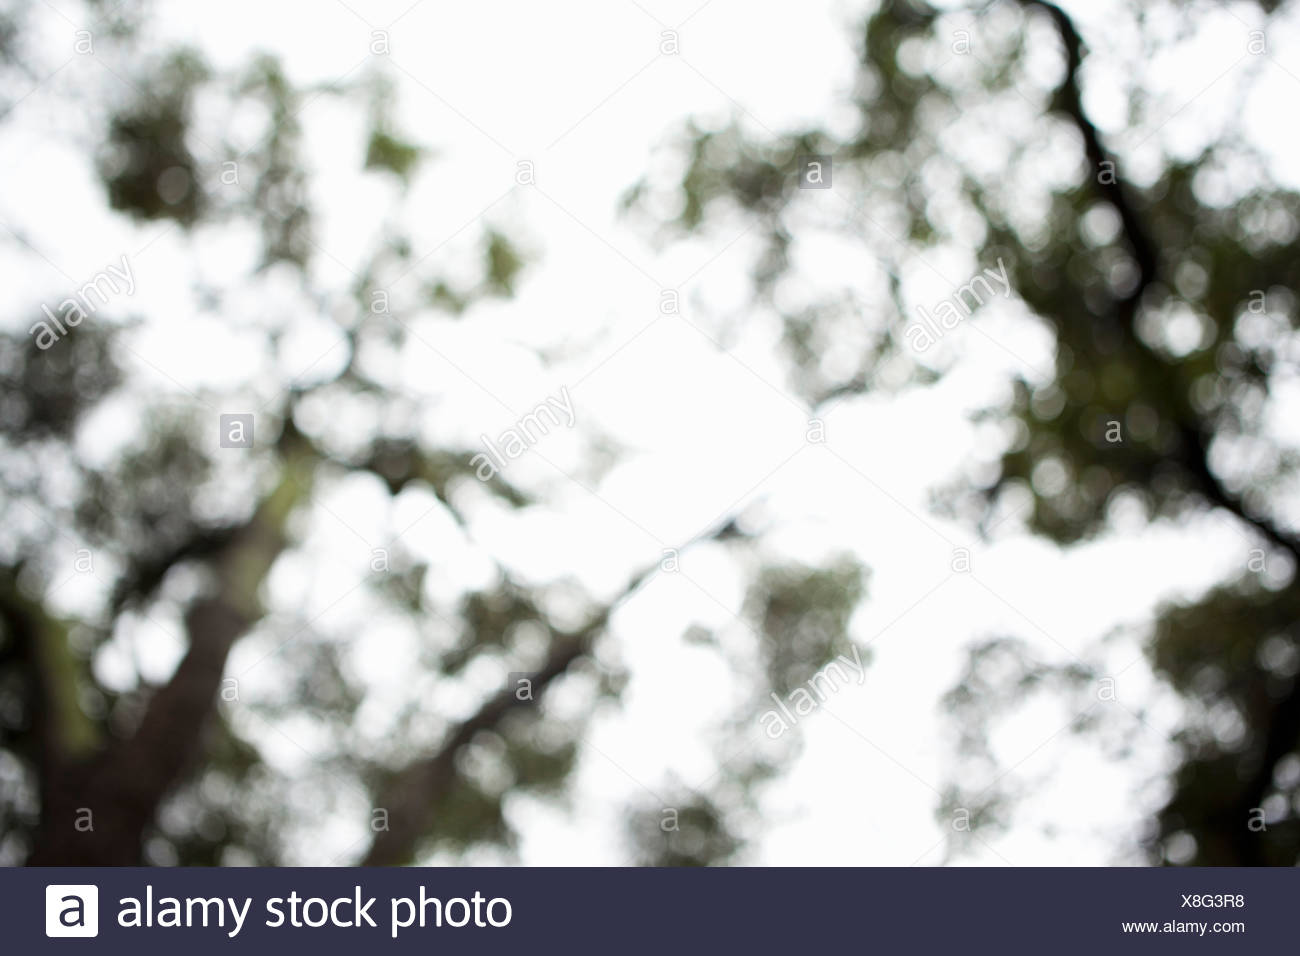 Defocussed view of tree tops - Stock Image